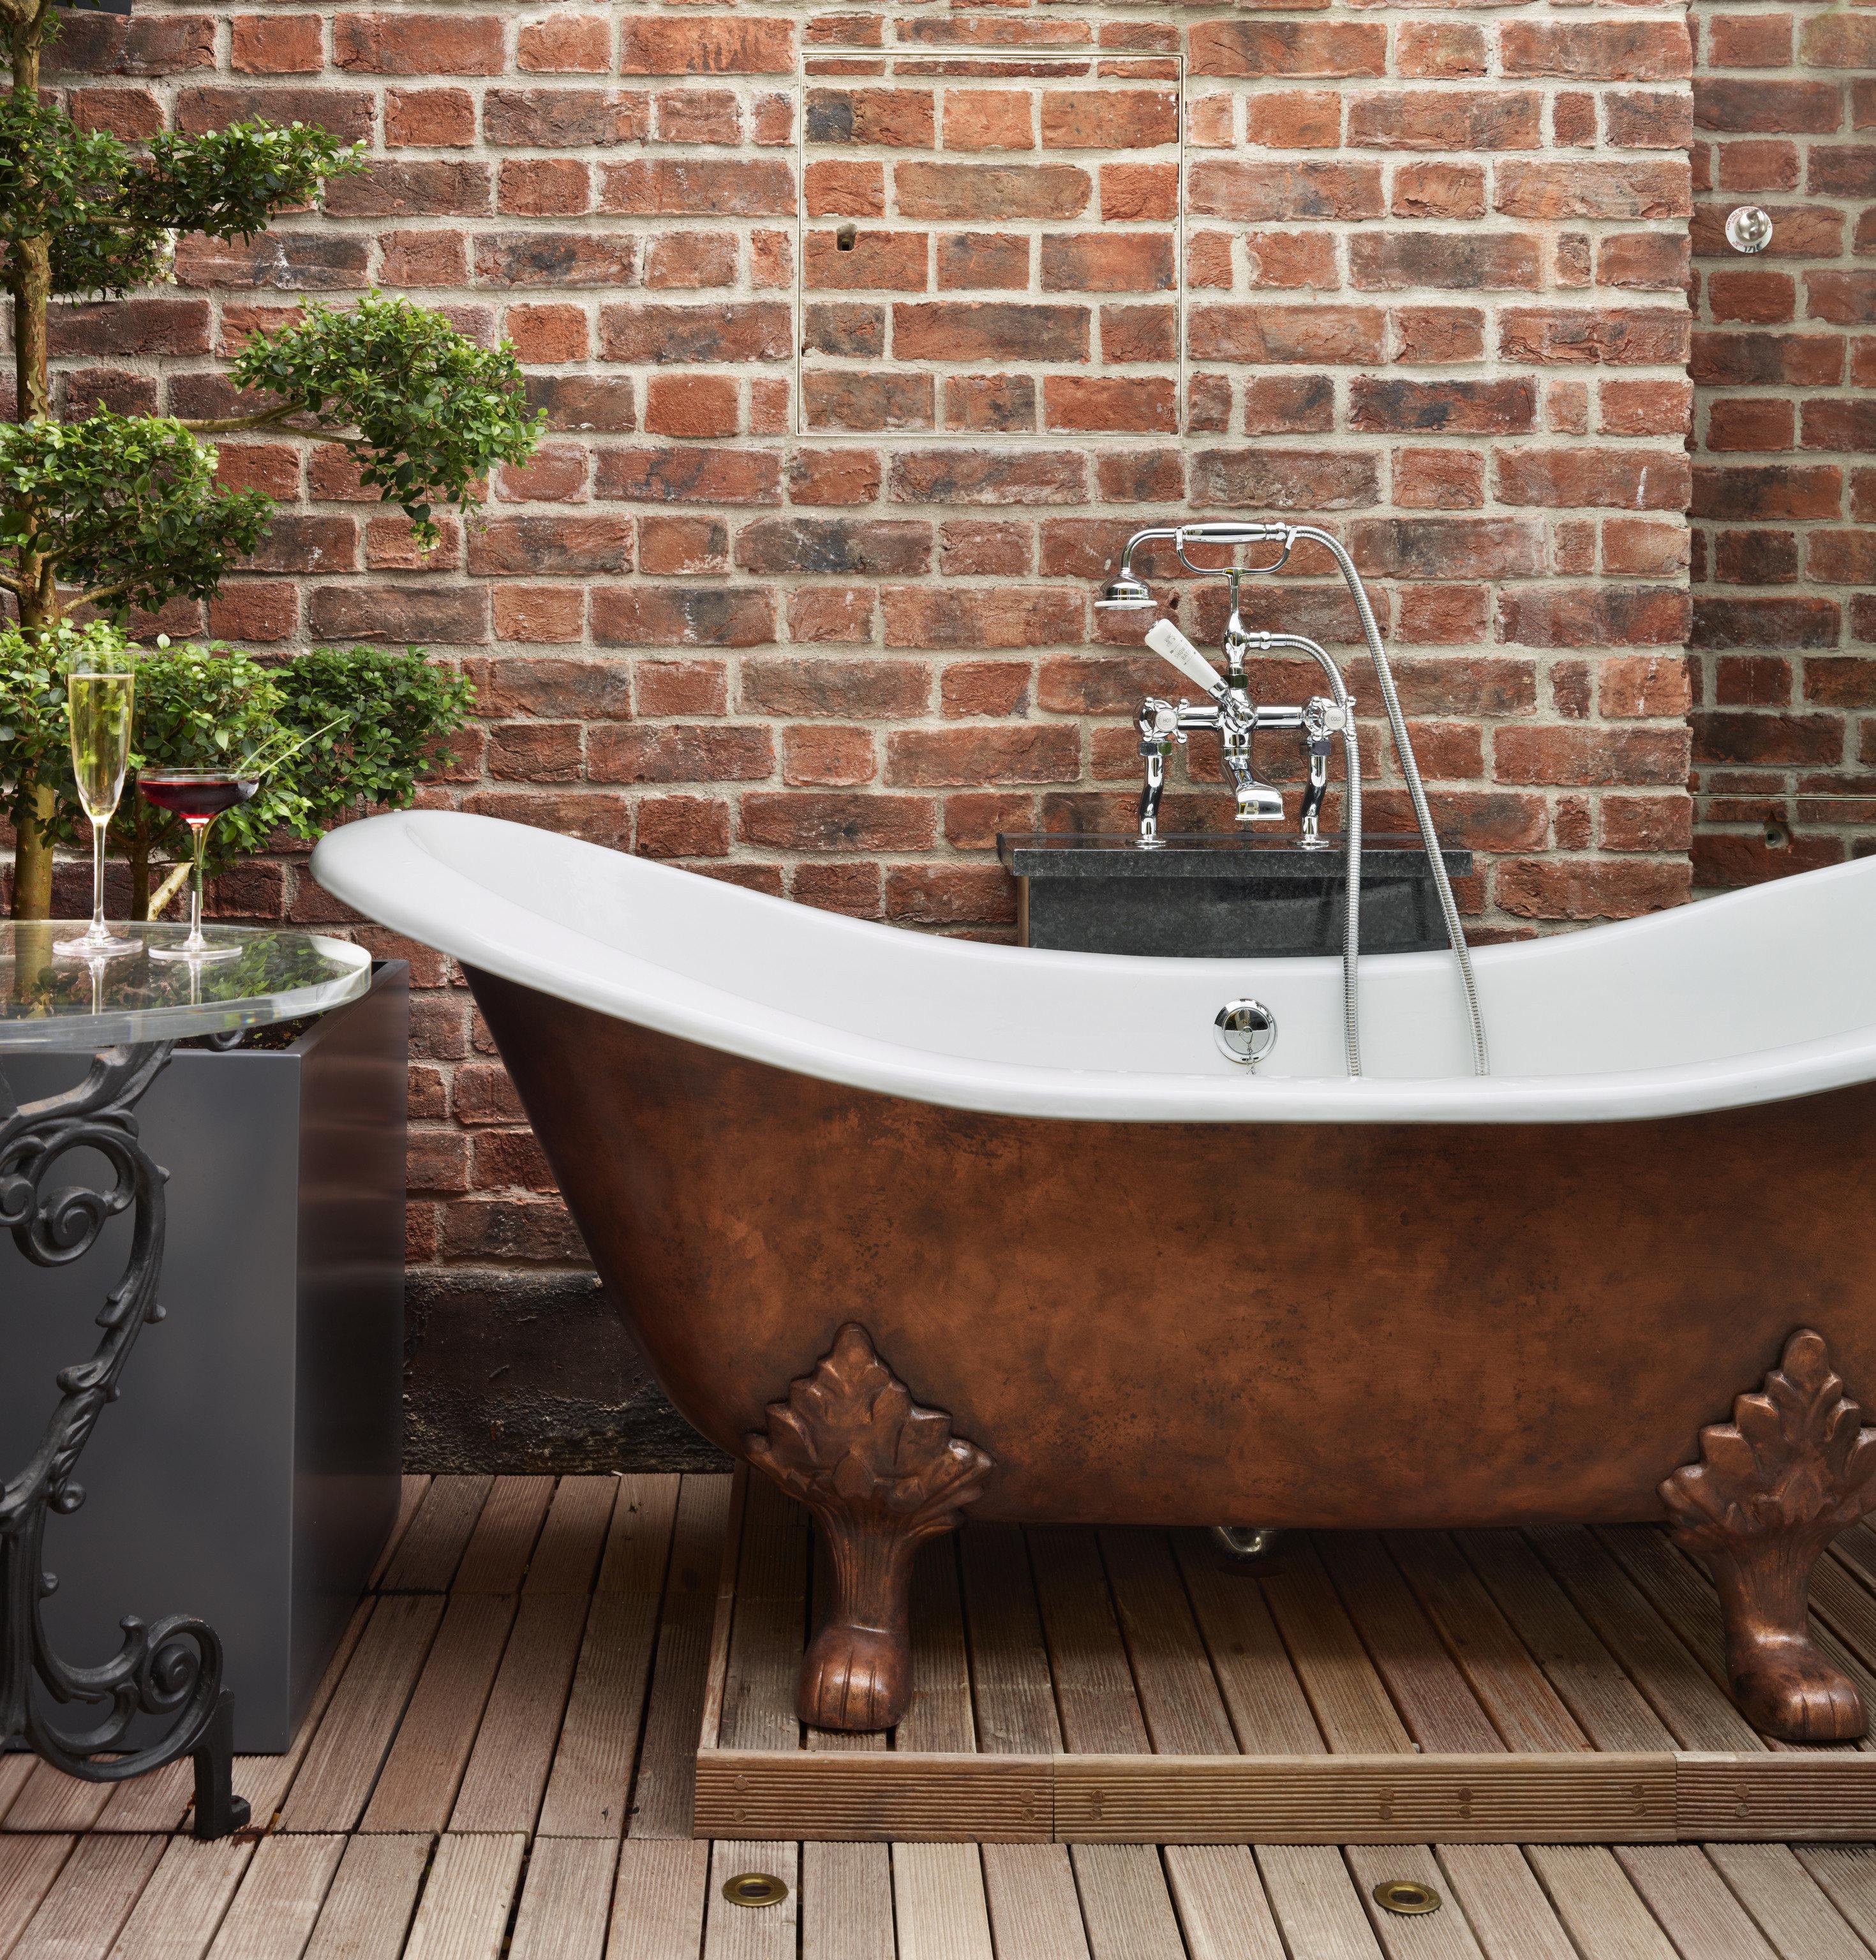 bathtub man made object plumbing fixture sink swimming pool bidet flooring tile